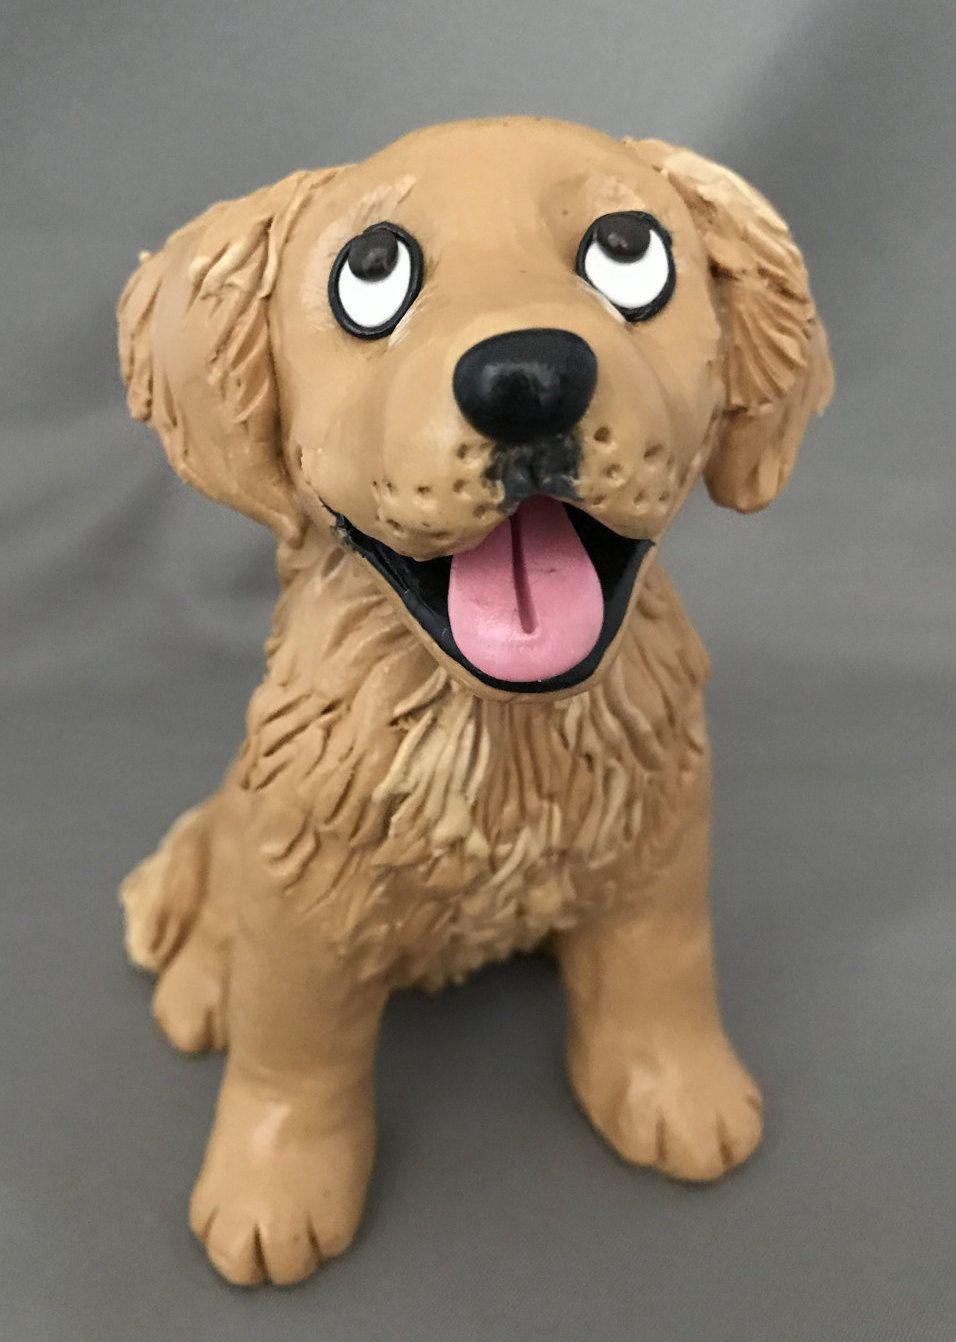 Golden Retriever Dog Figurine By Houndsofhope On Etsy Polymer